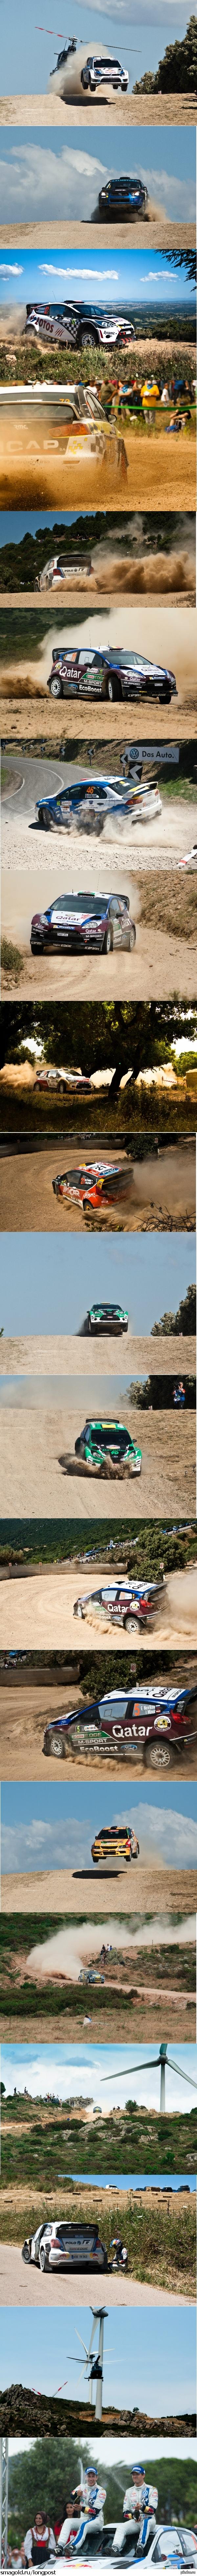 WRC Rally Сардиния 2013 Фотографировала сама.